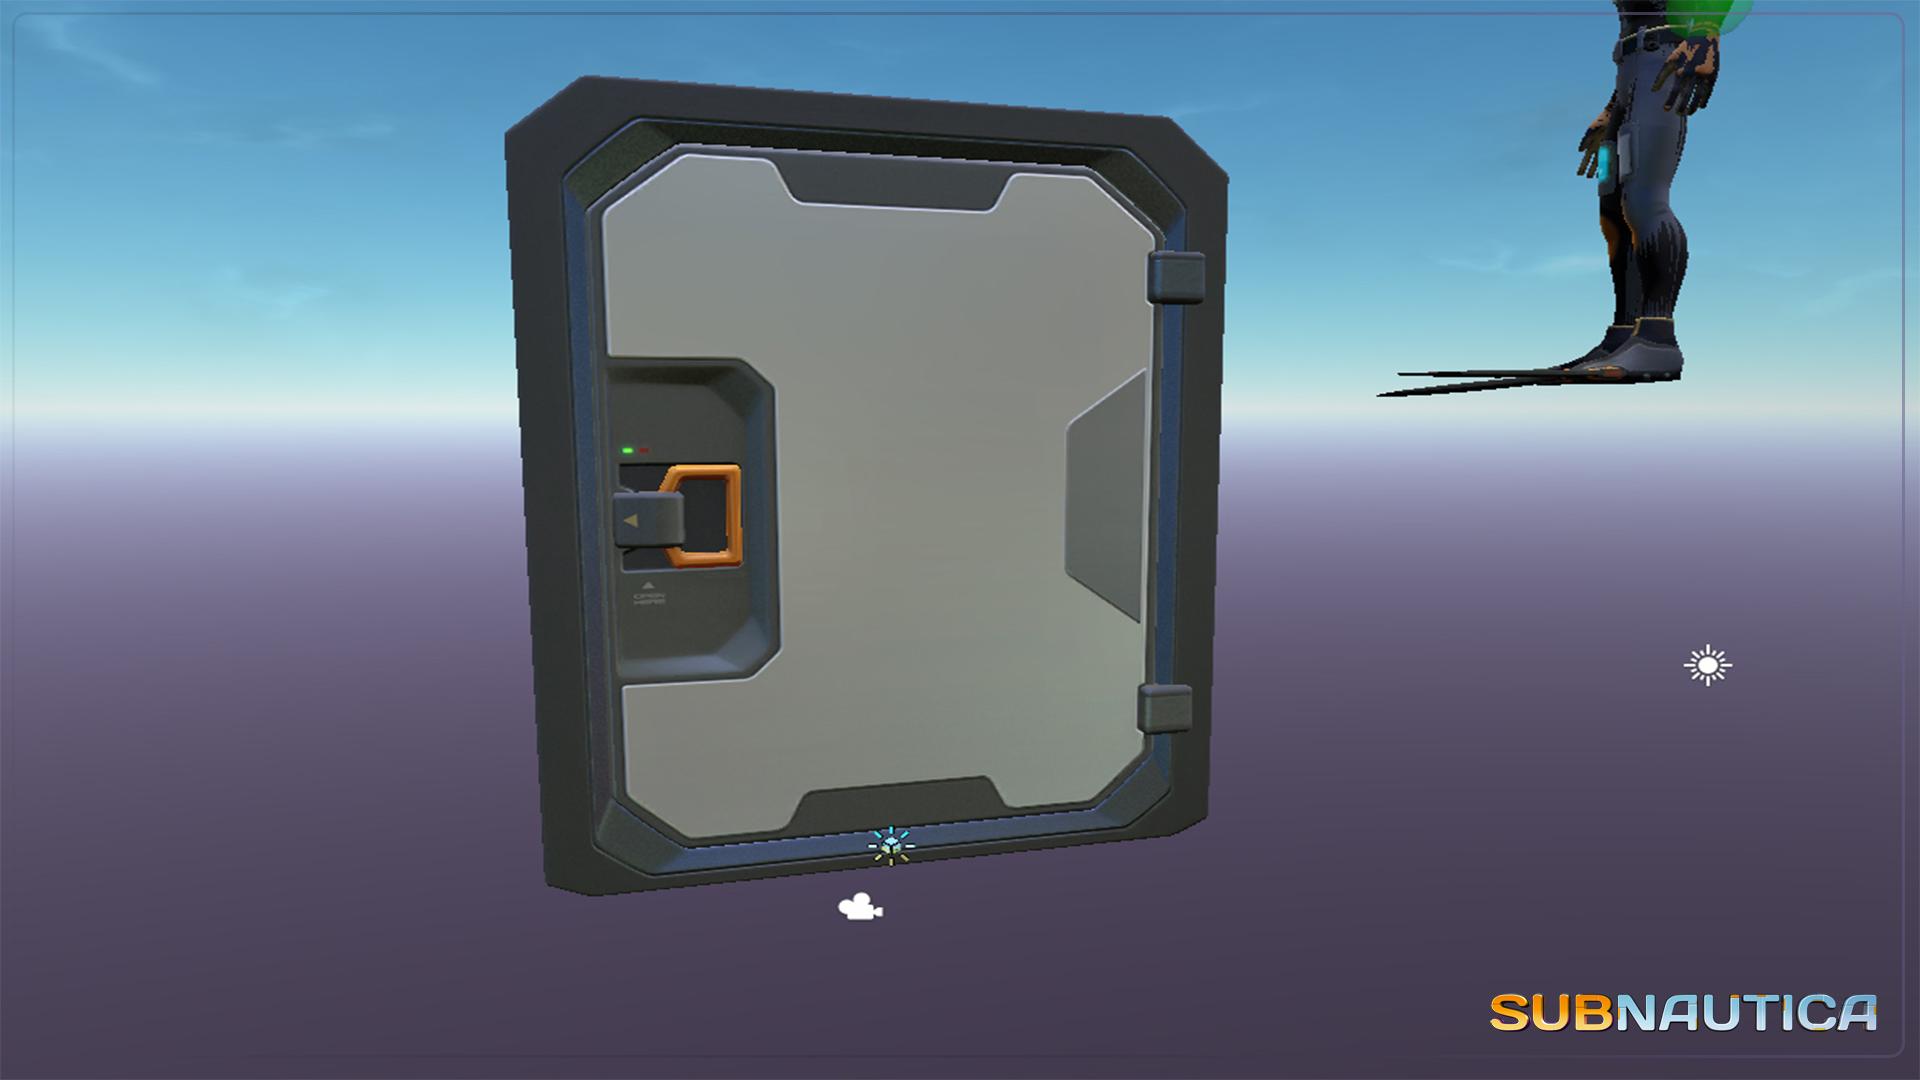 Starship Doors Manual 01 In Game.jpg & Image - Starship Doors Manual 01 In Game.jpg   Subnautica Wiki ...